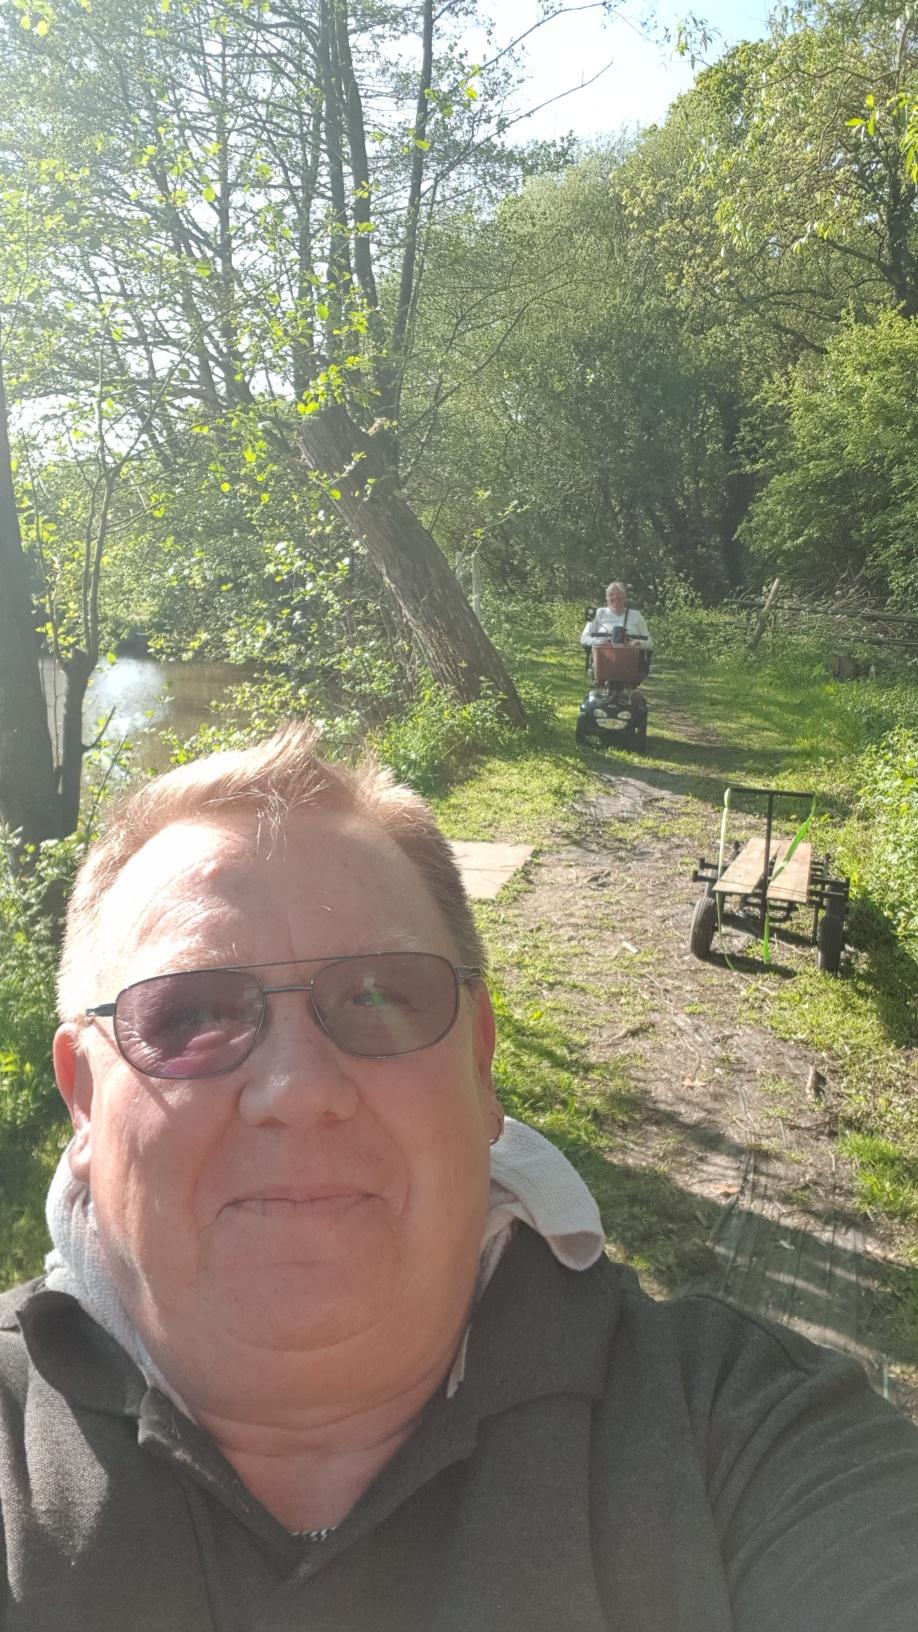 Dave Selfie showing sue P